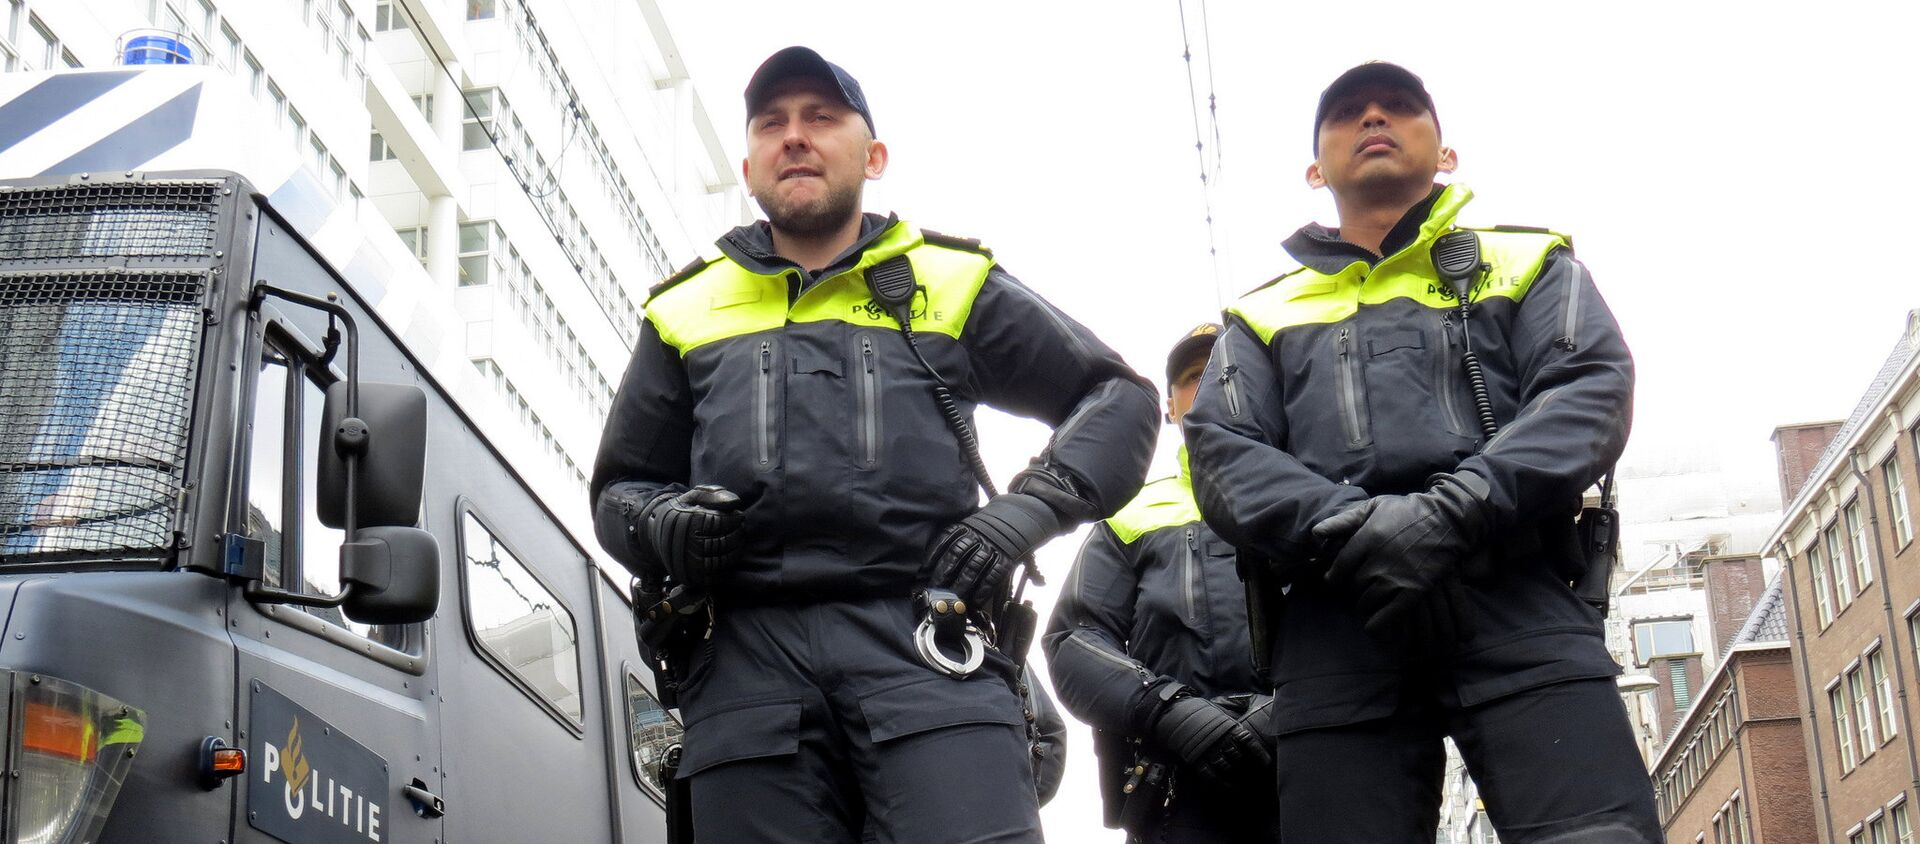 Agenti di polizia olandesi - Sputnik Italia, 1920, 08.04.2021